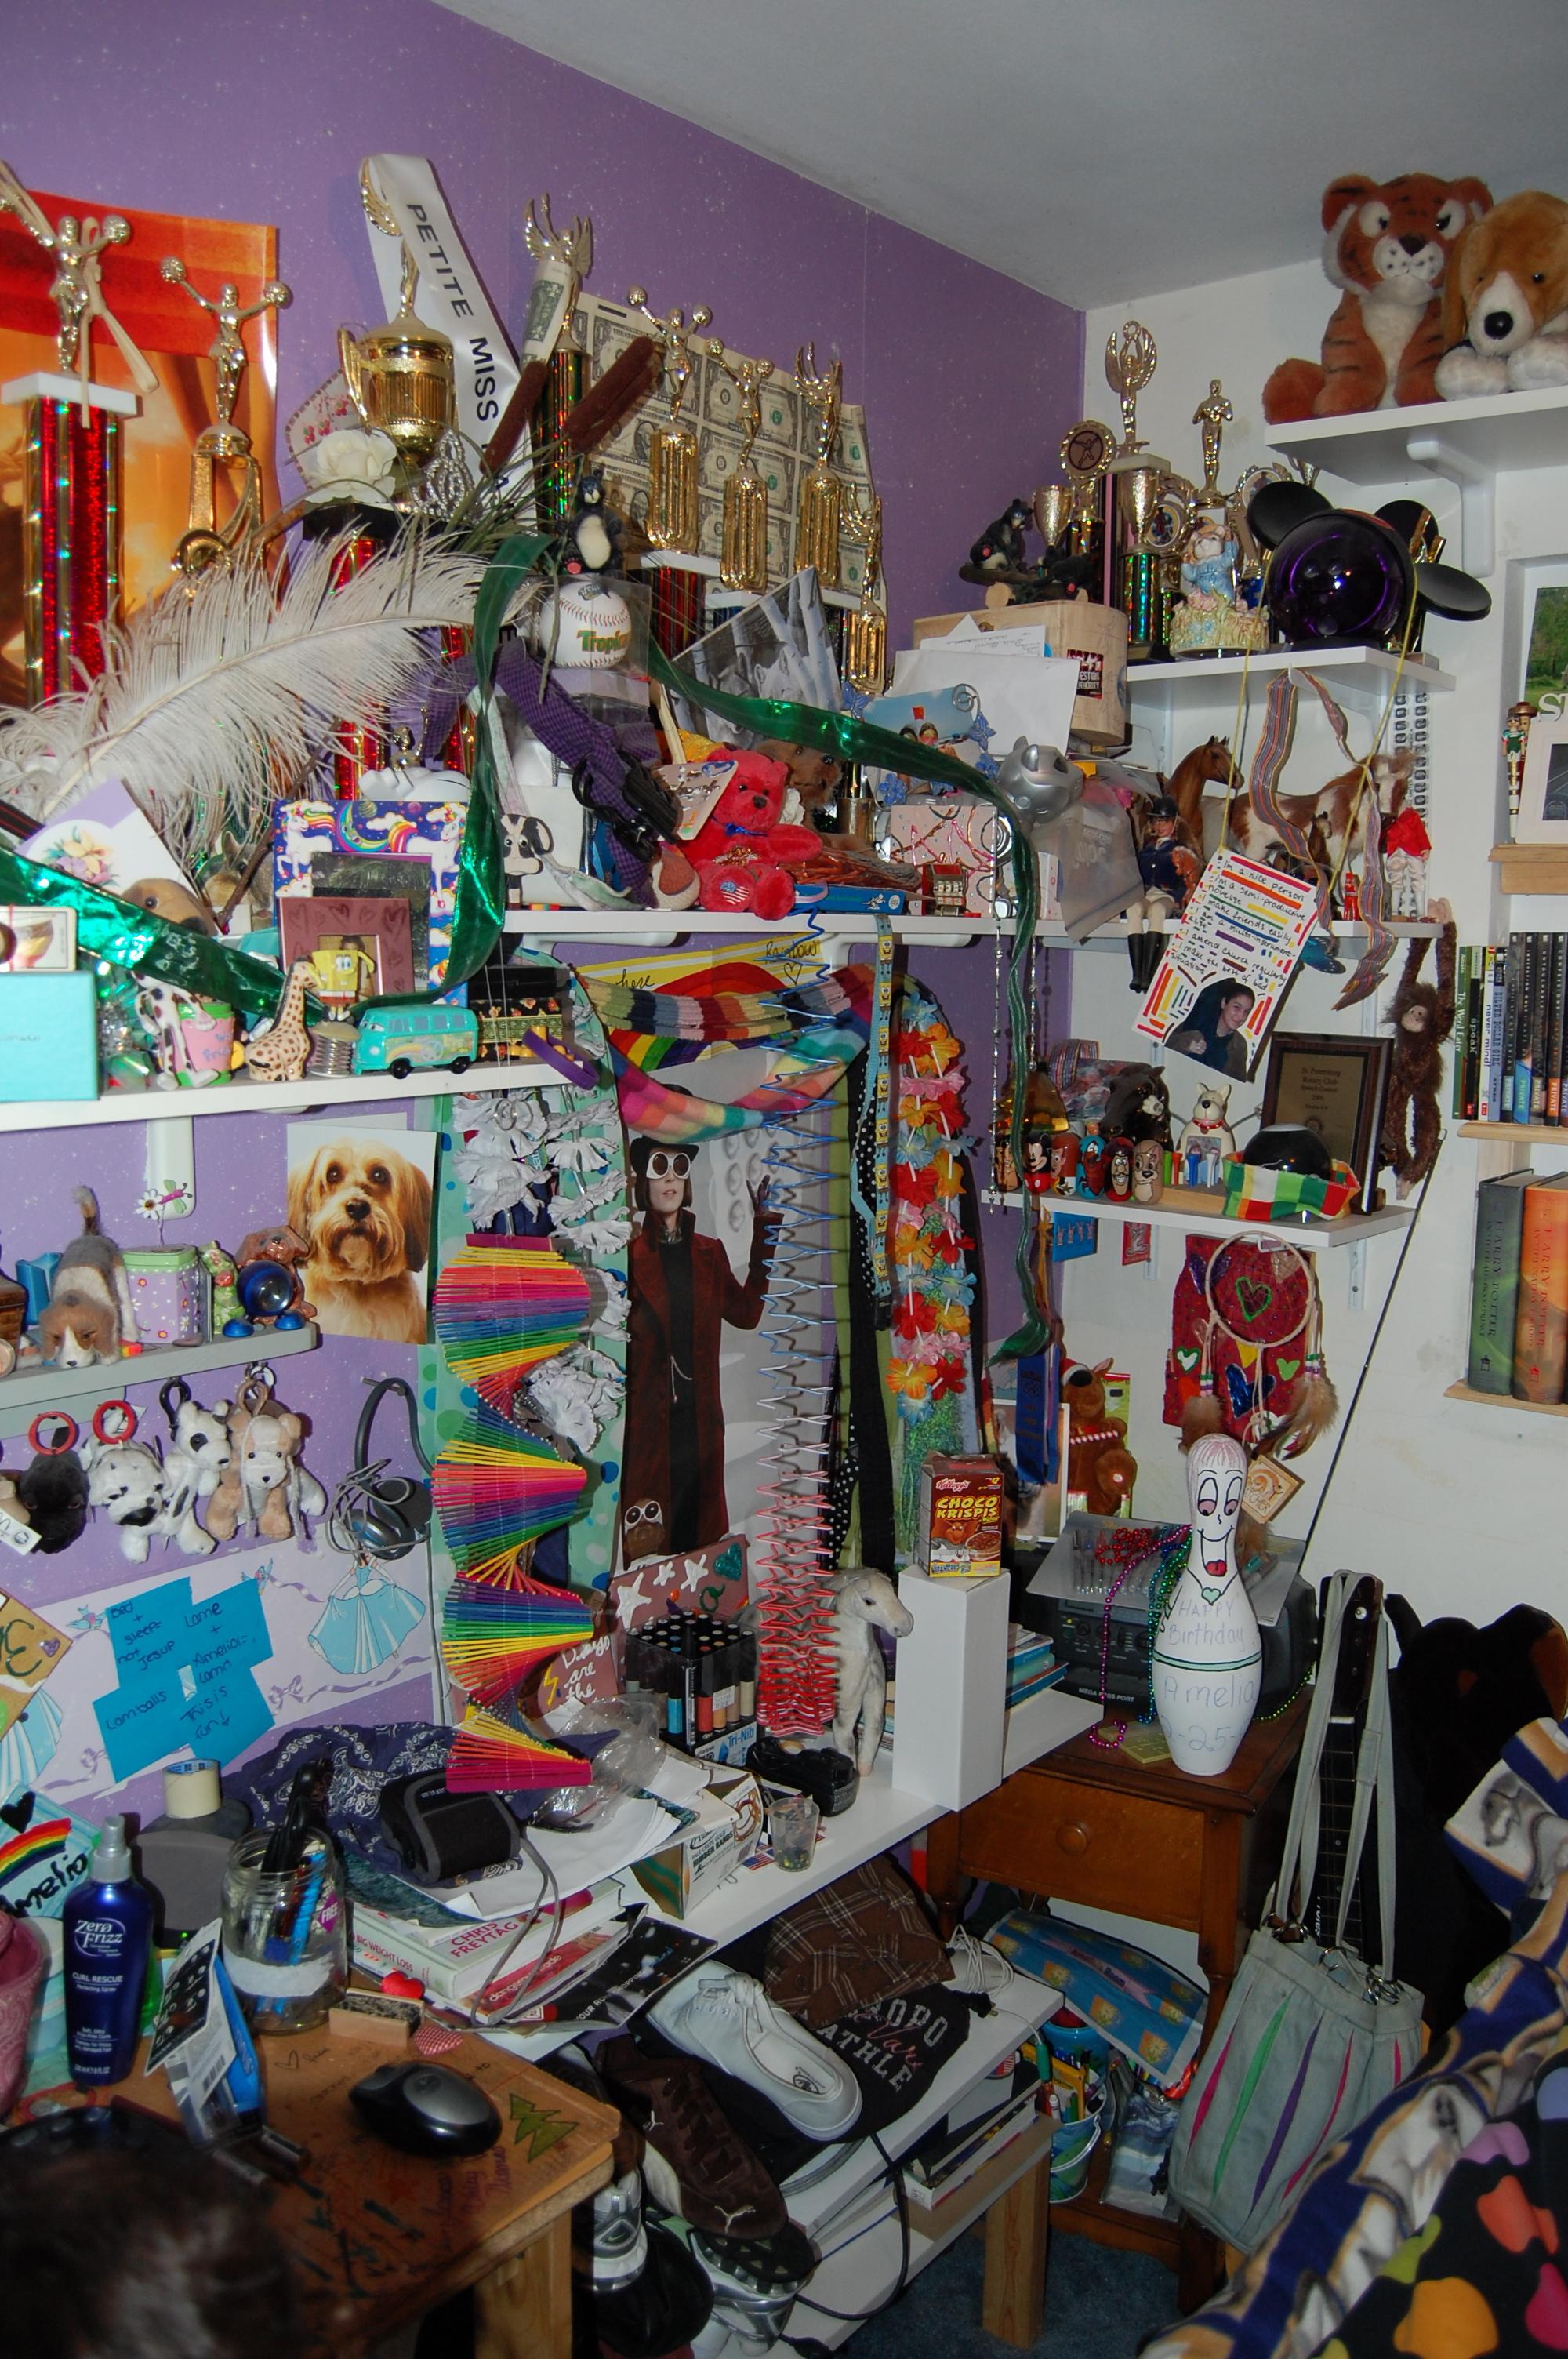 My childhood bedroom, circa 2007